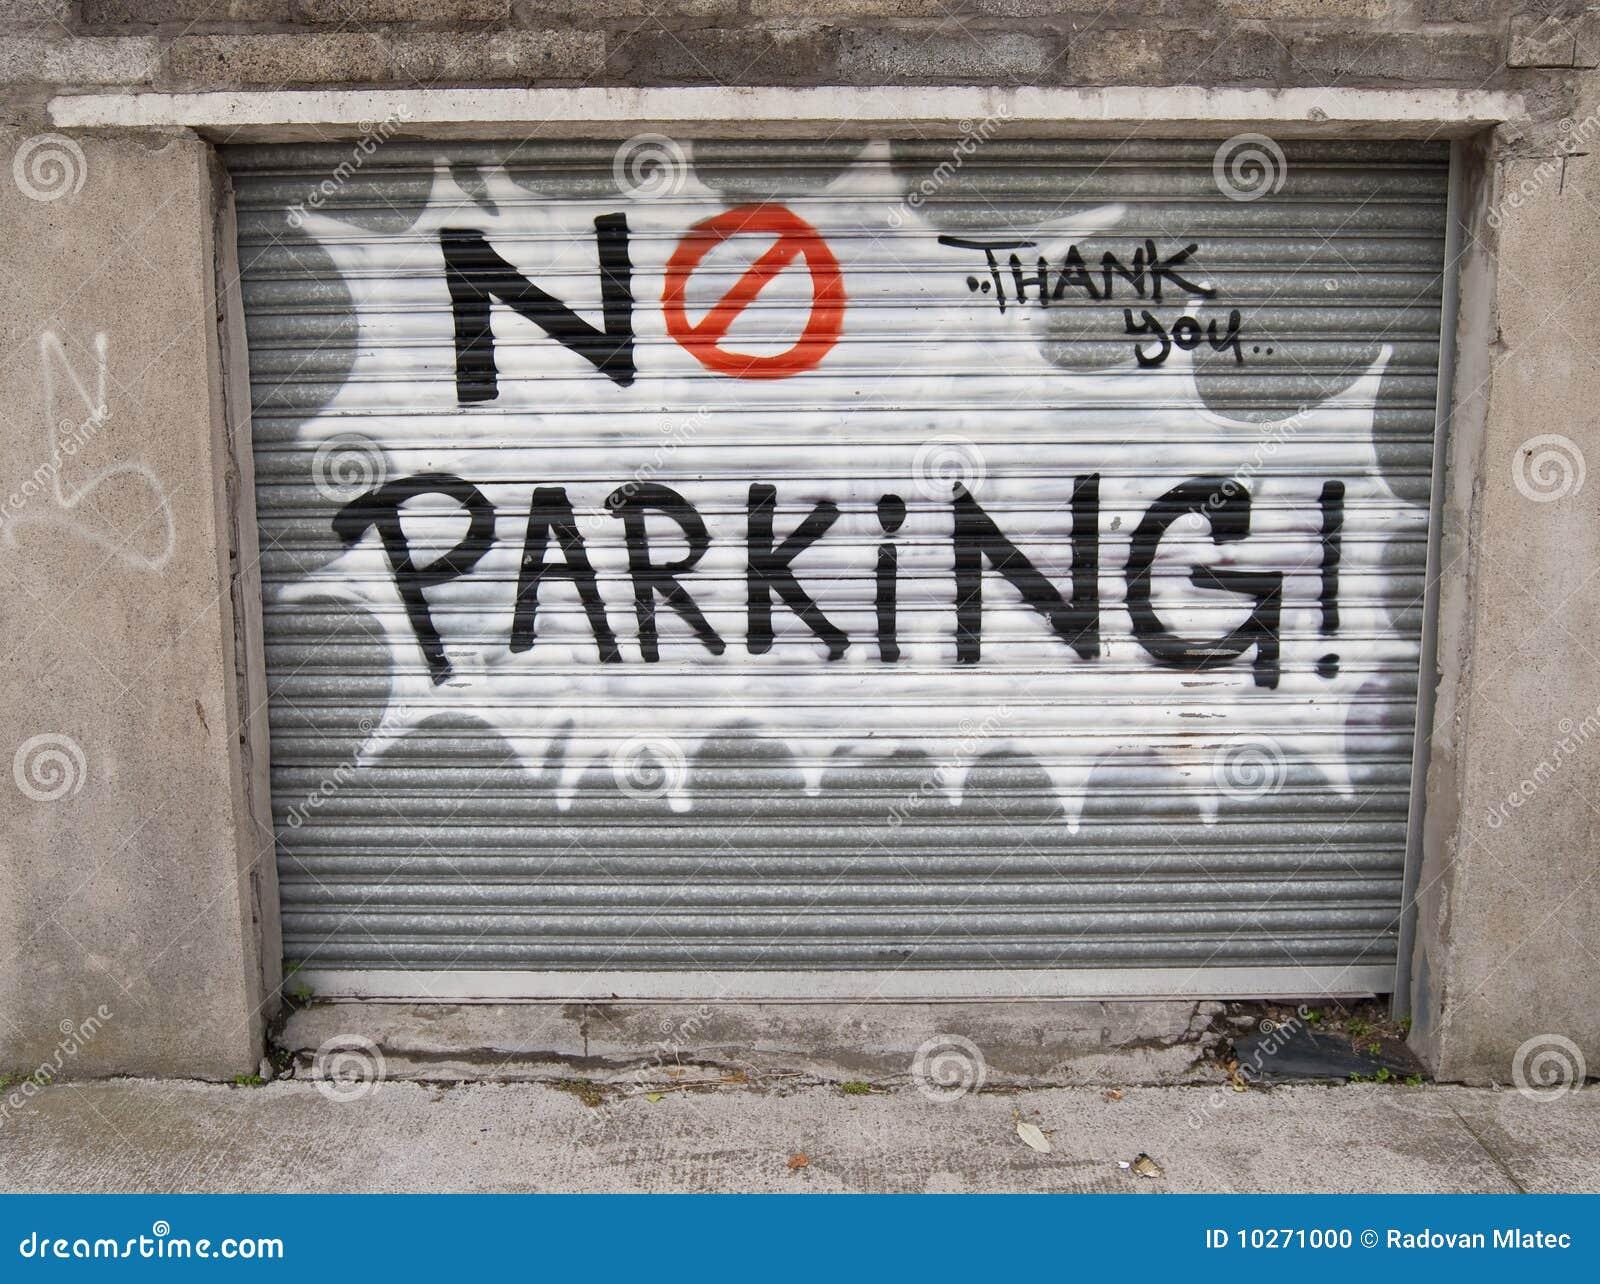 No Parking Graffiti Stock Photo Image 10271000